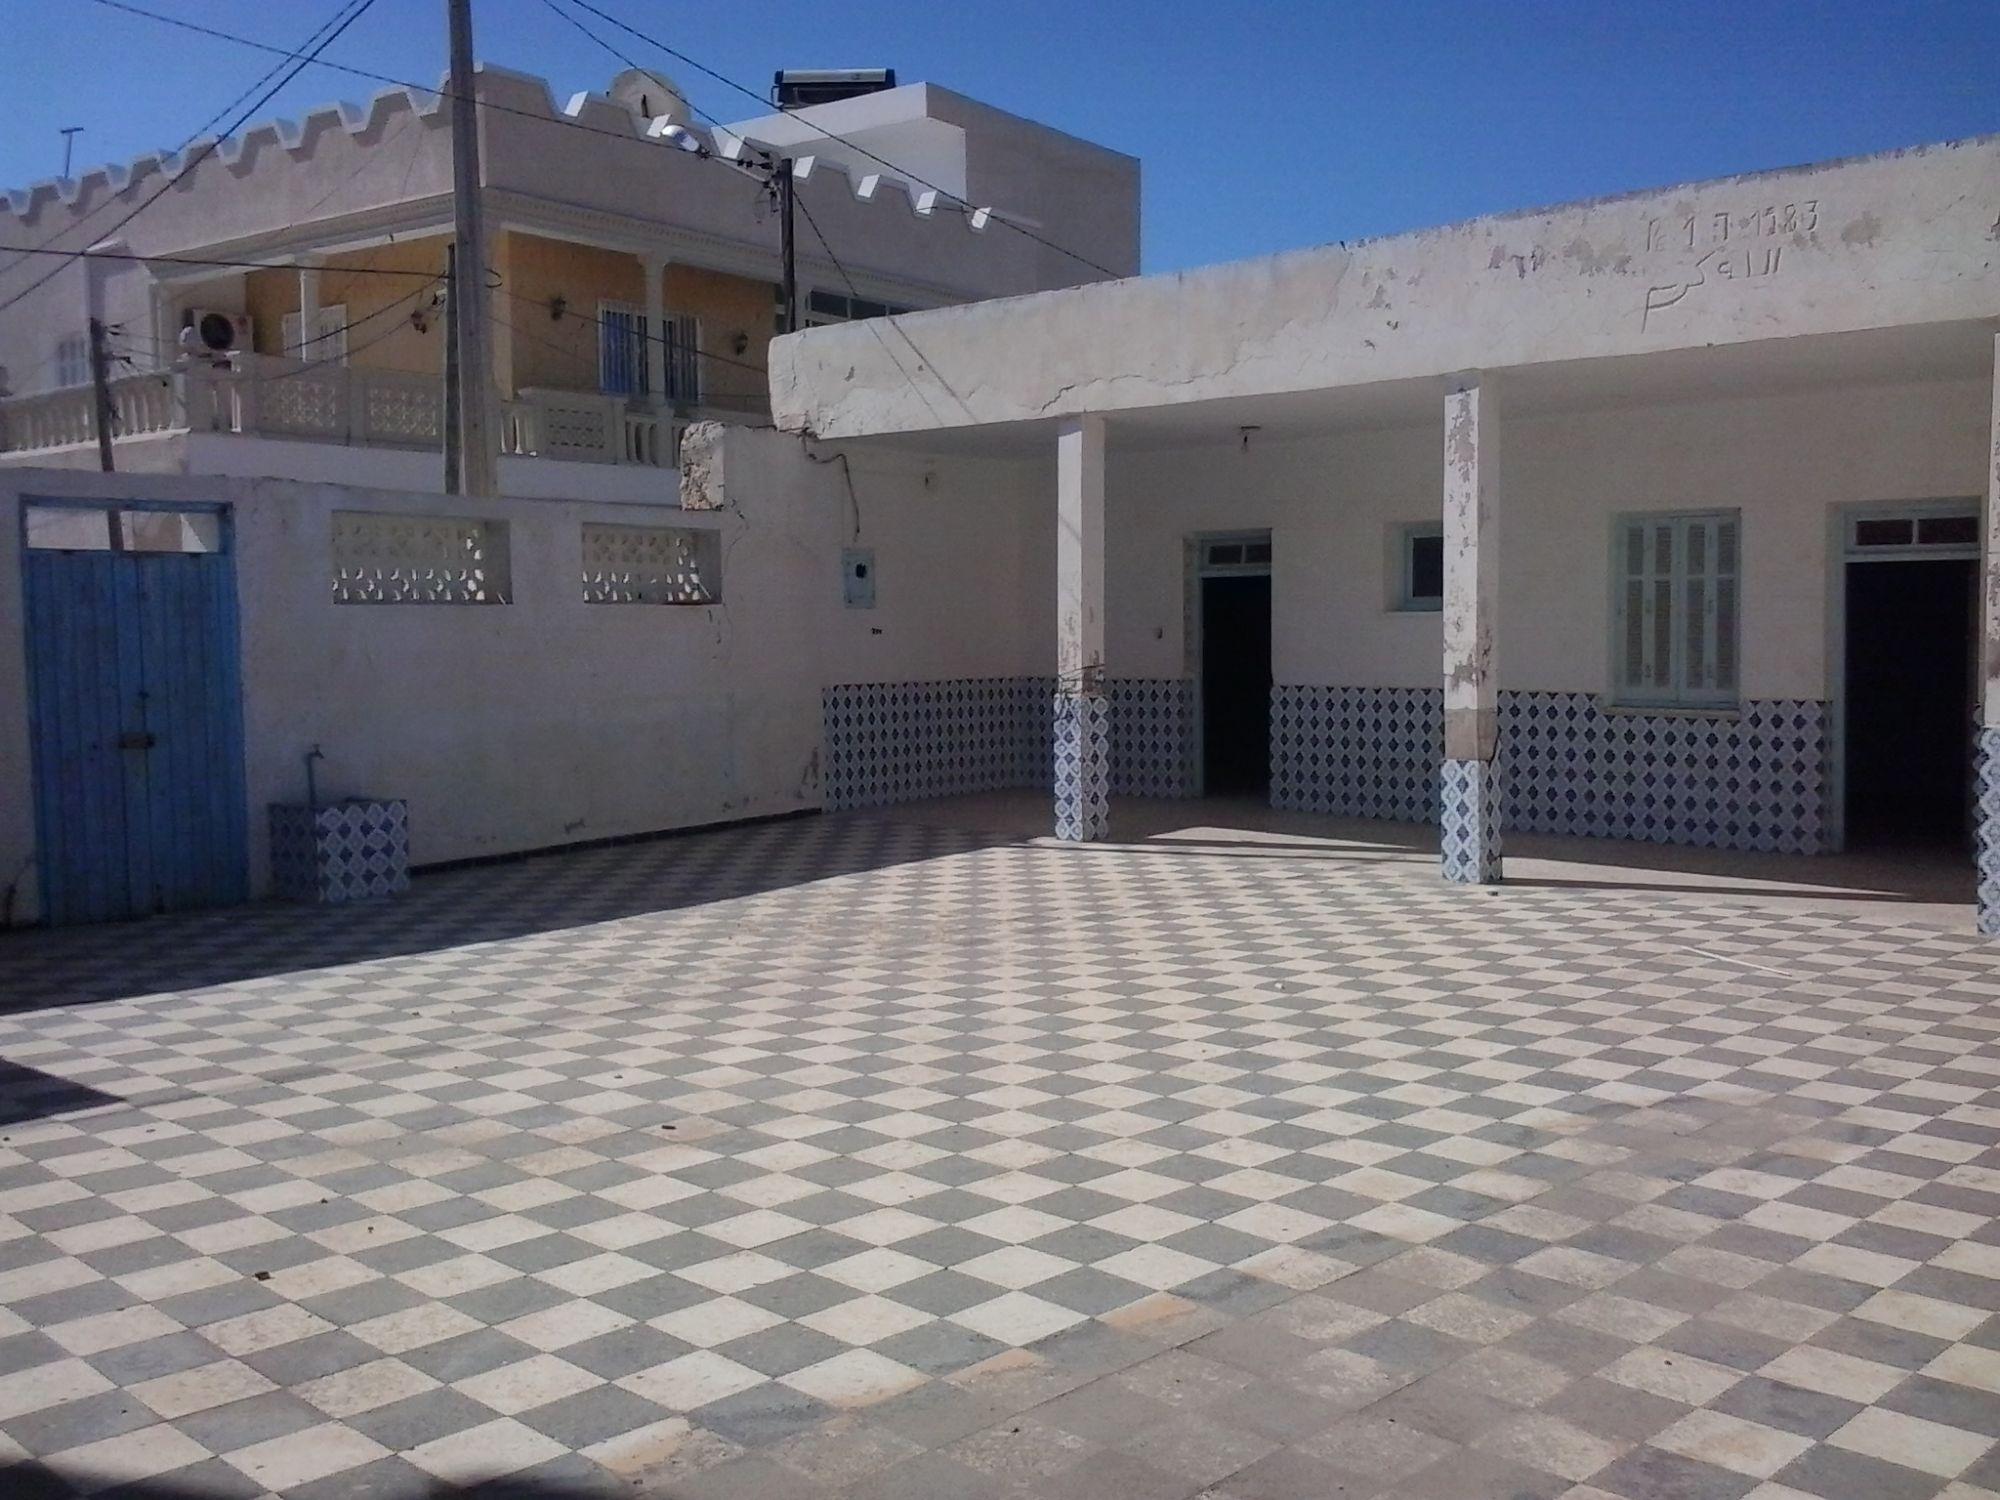 Tayara Vente Maison Sousse Avie Home